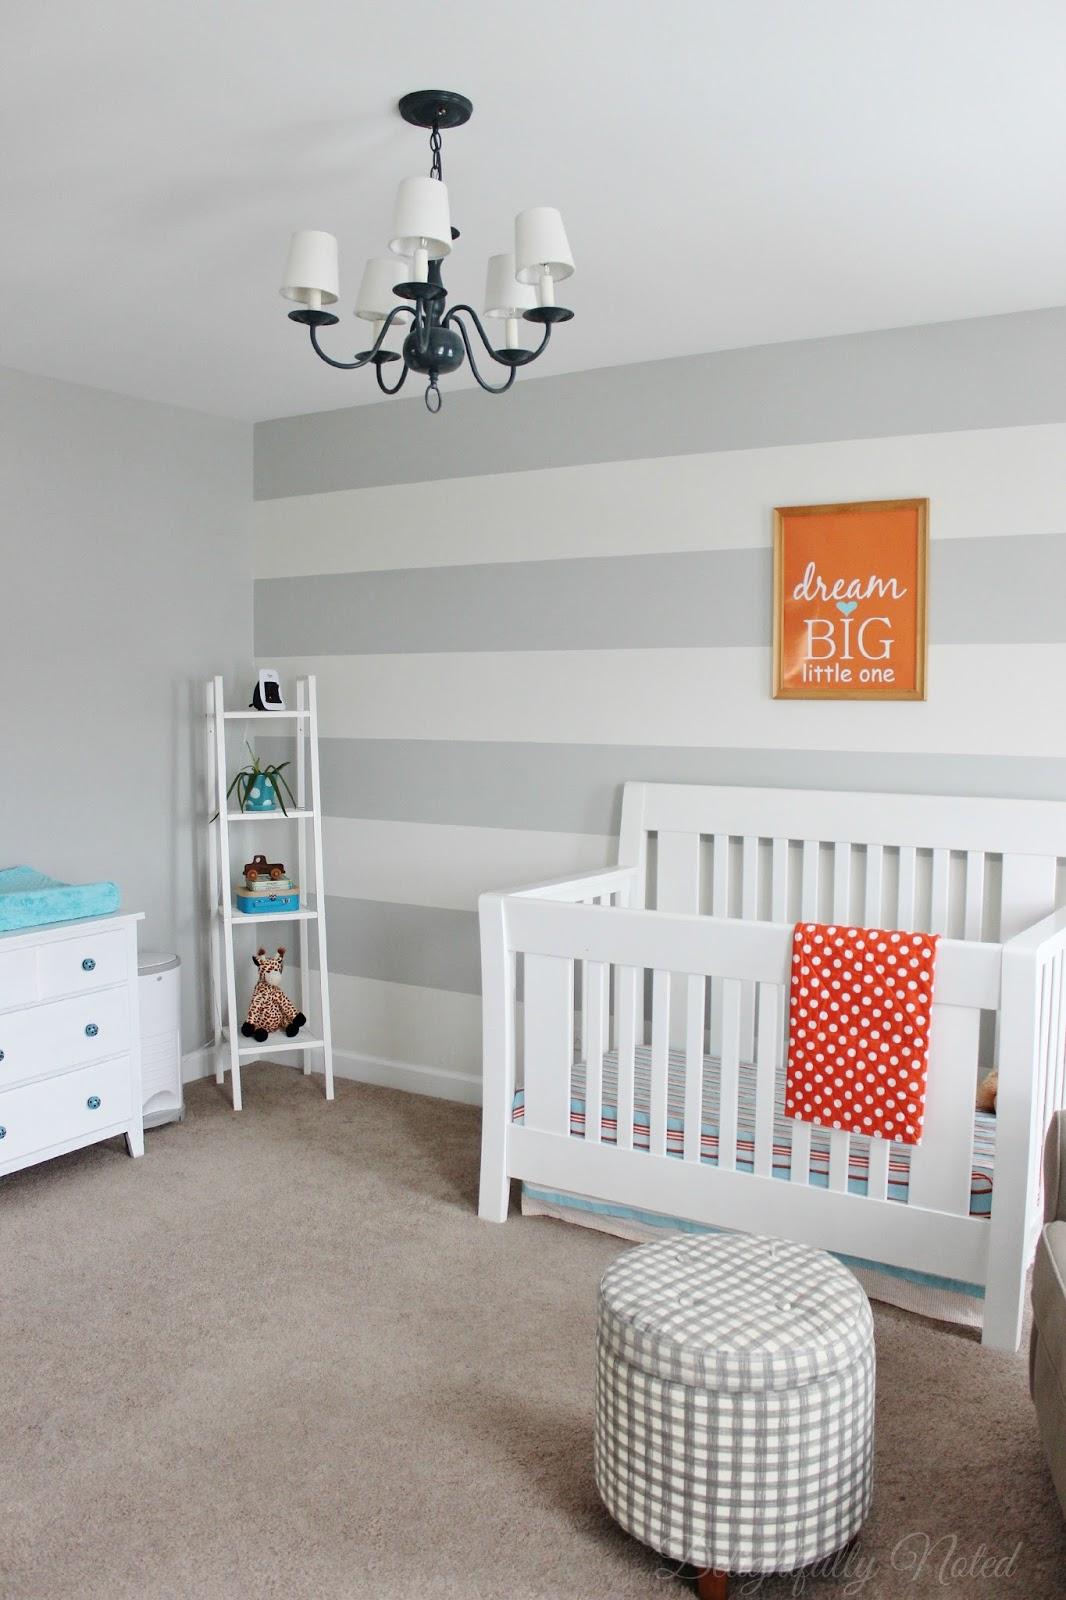 Delightfully Noted Home Tour - Modern Fresh Farmhouse Decorating Ideas - Little Boys Room Nursery